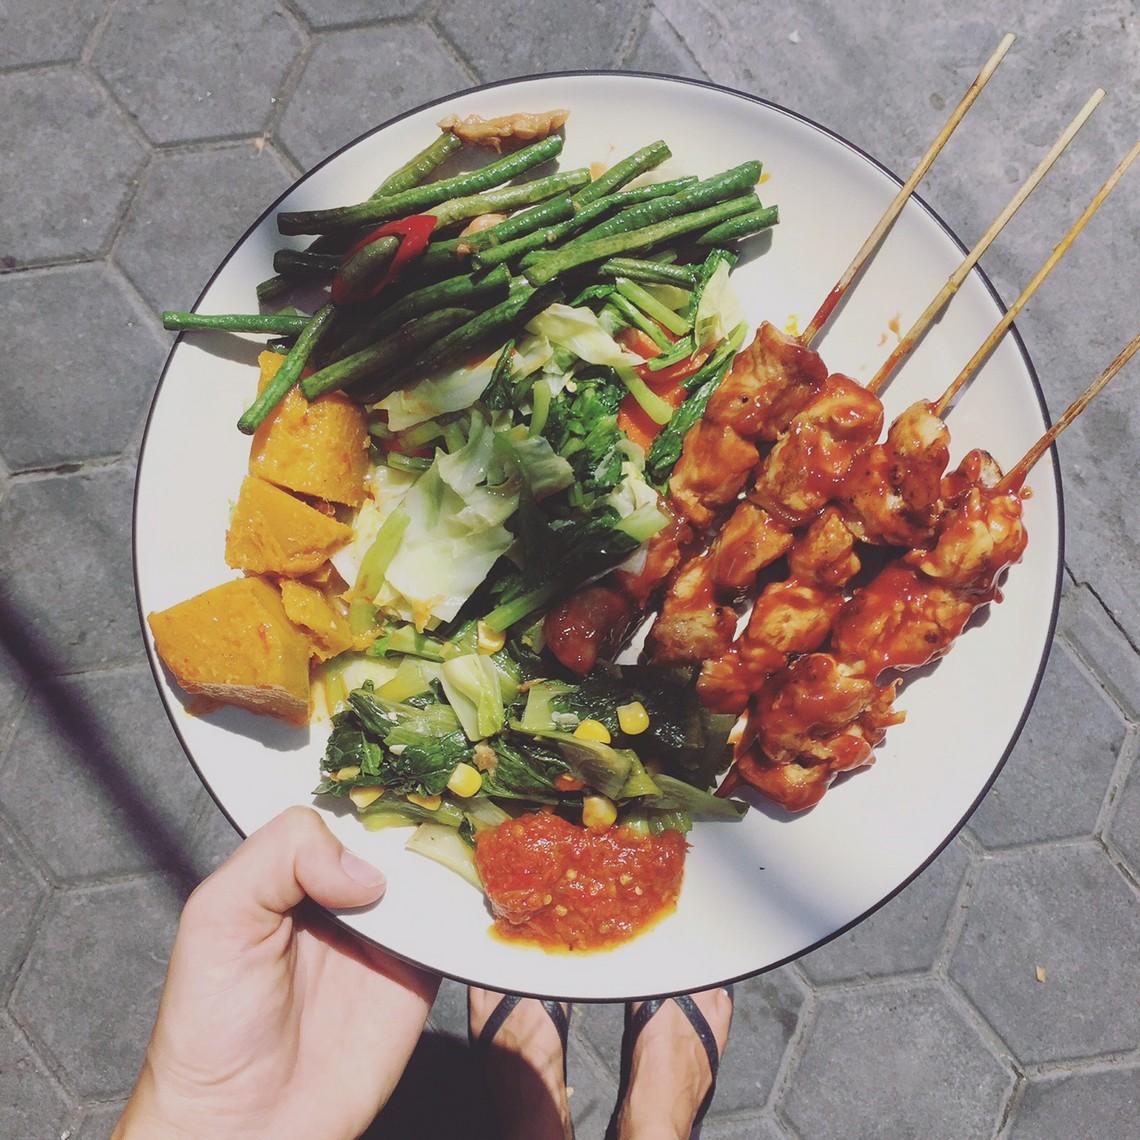 warung bumi, canggu, indonesisch, what i eat in a day